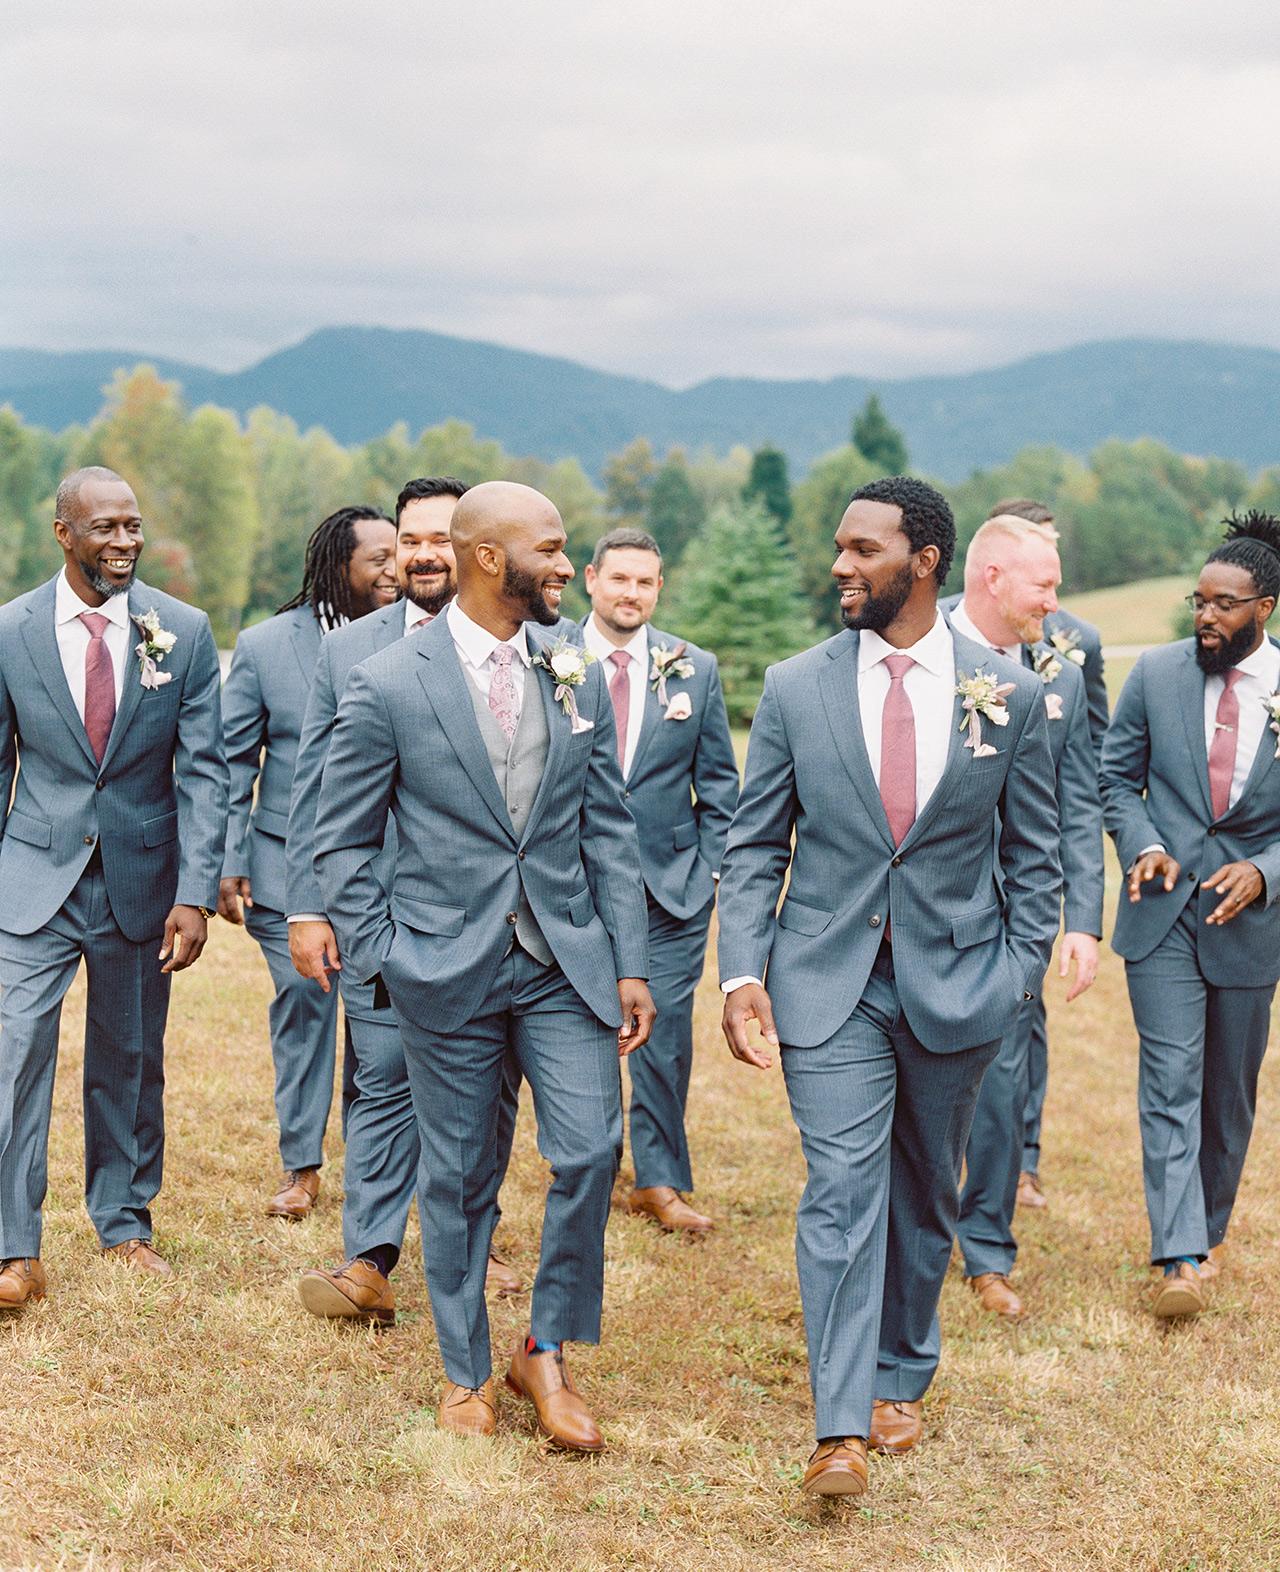 groom groomsmen light blue tuxedos fig-color ties